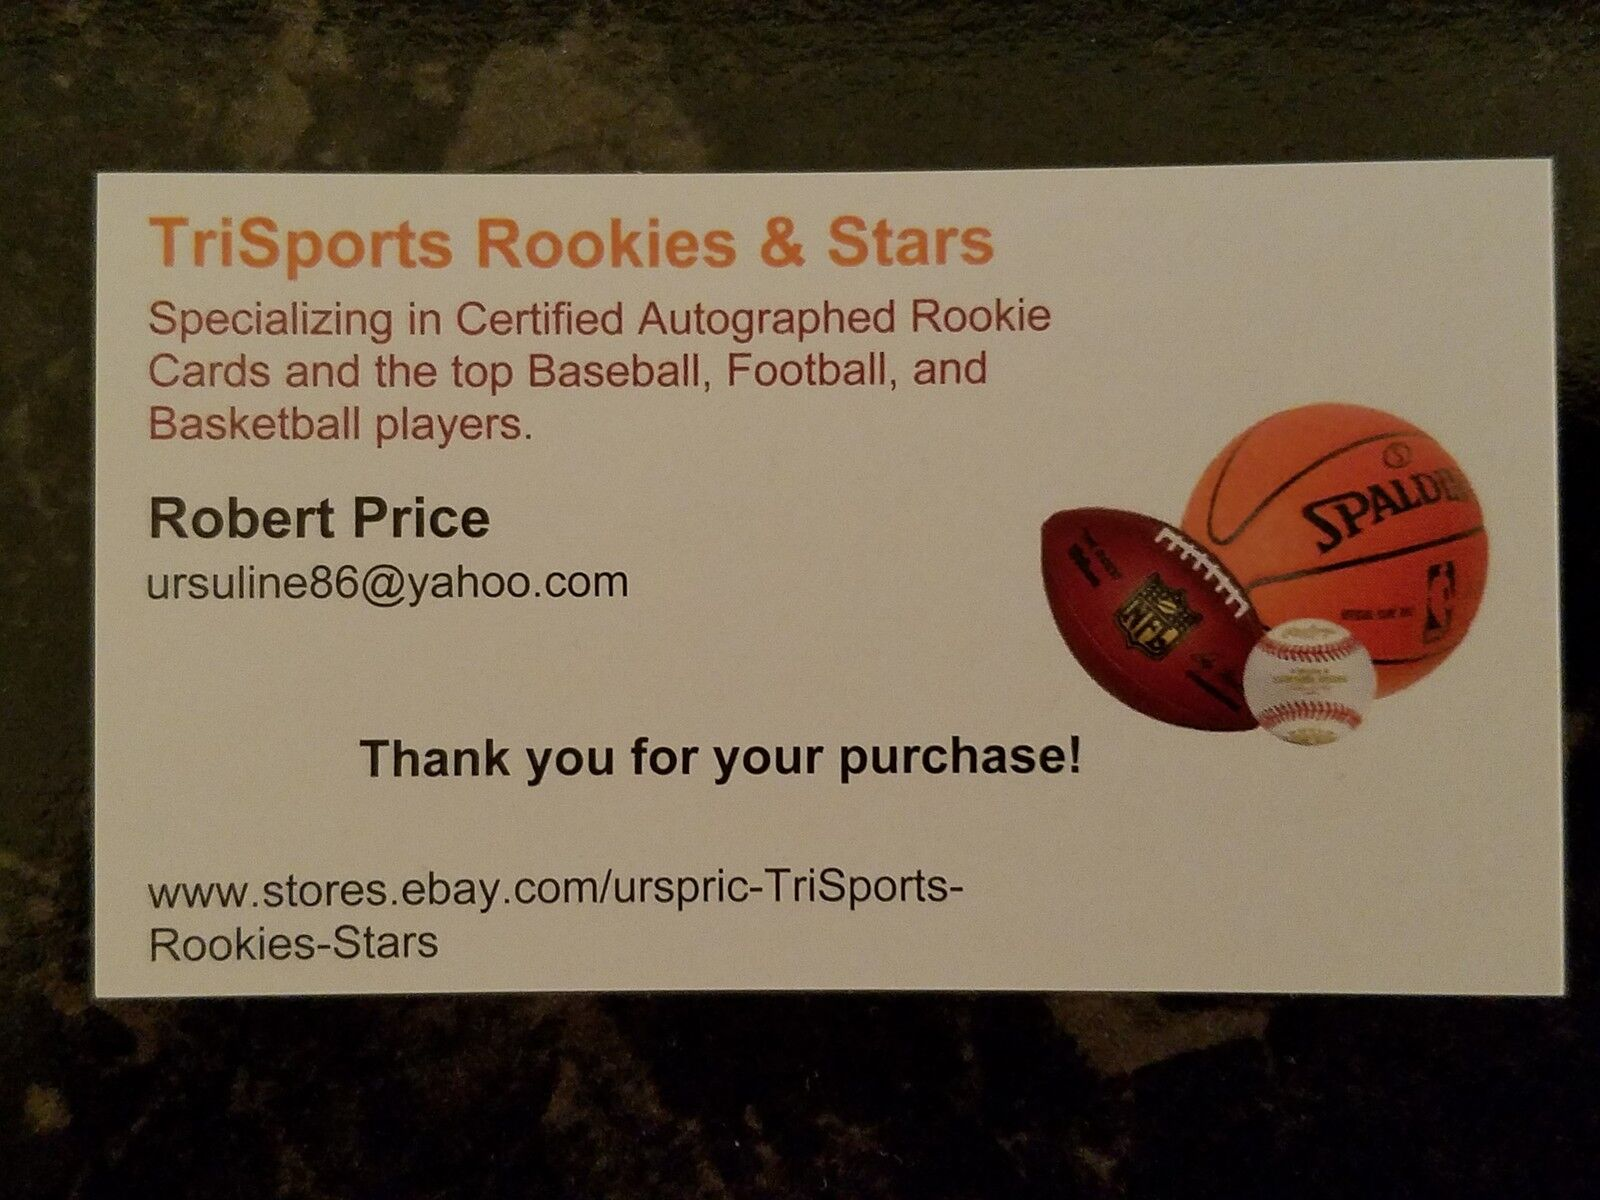 urspric TriSports Rookies&Stars